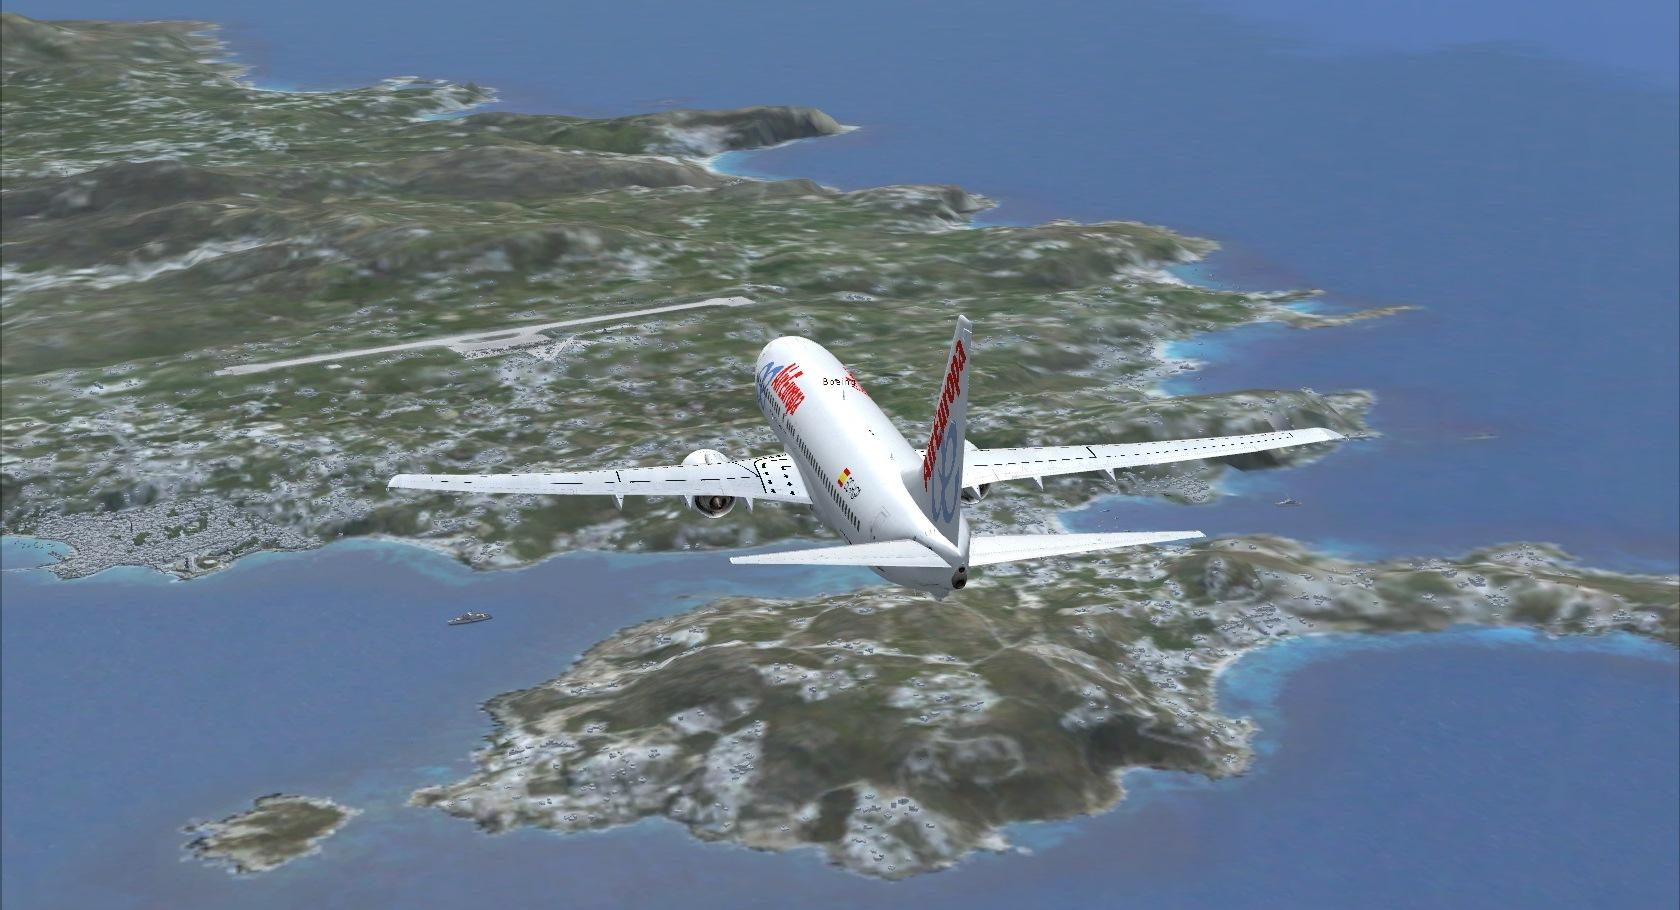 First landing Mykonos 8840930651_88f7fac050_o